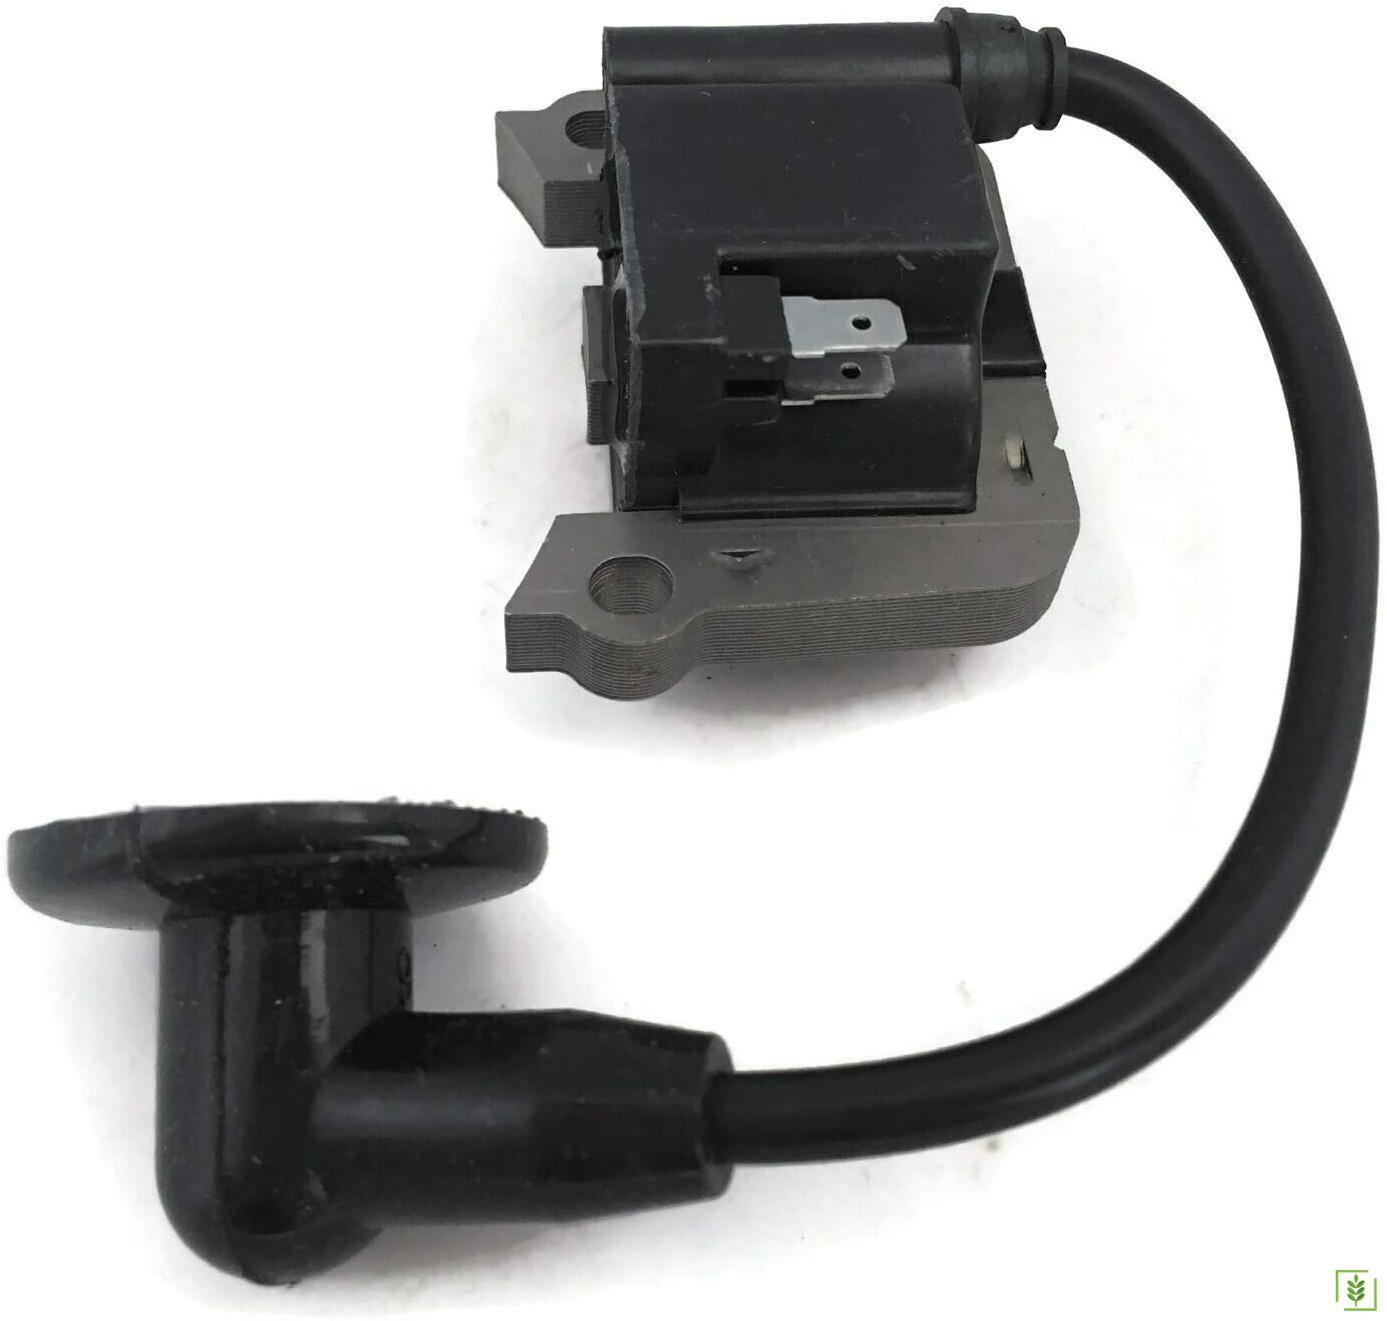 Alpina B33D Tırpan-Stiga SMT 226 Multi Tırpan Elektronik Bobin